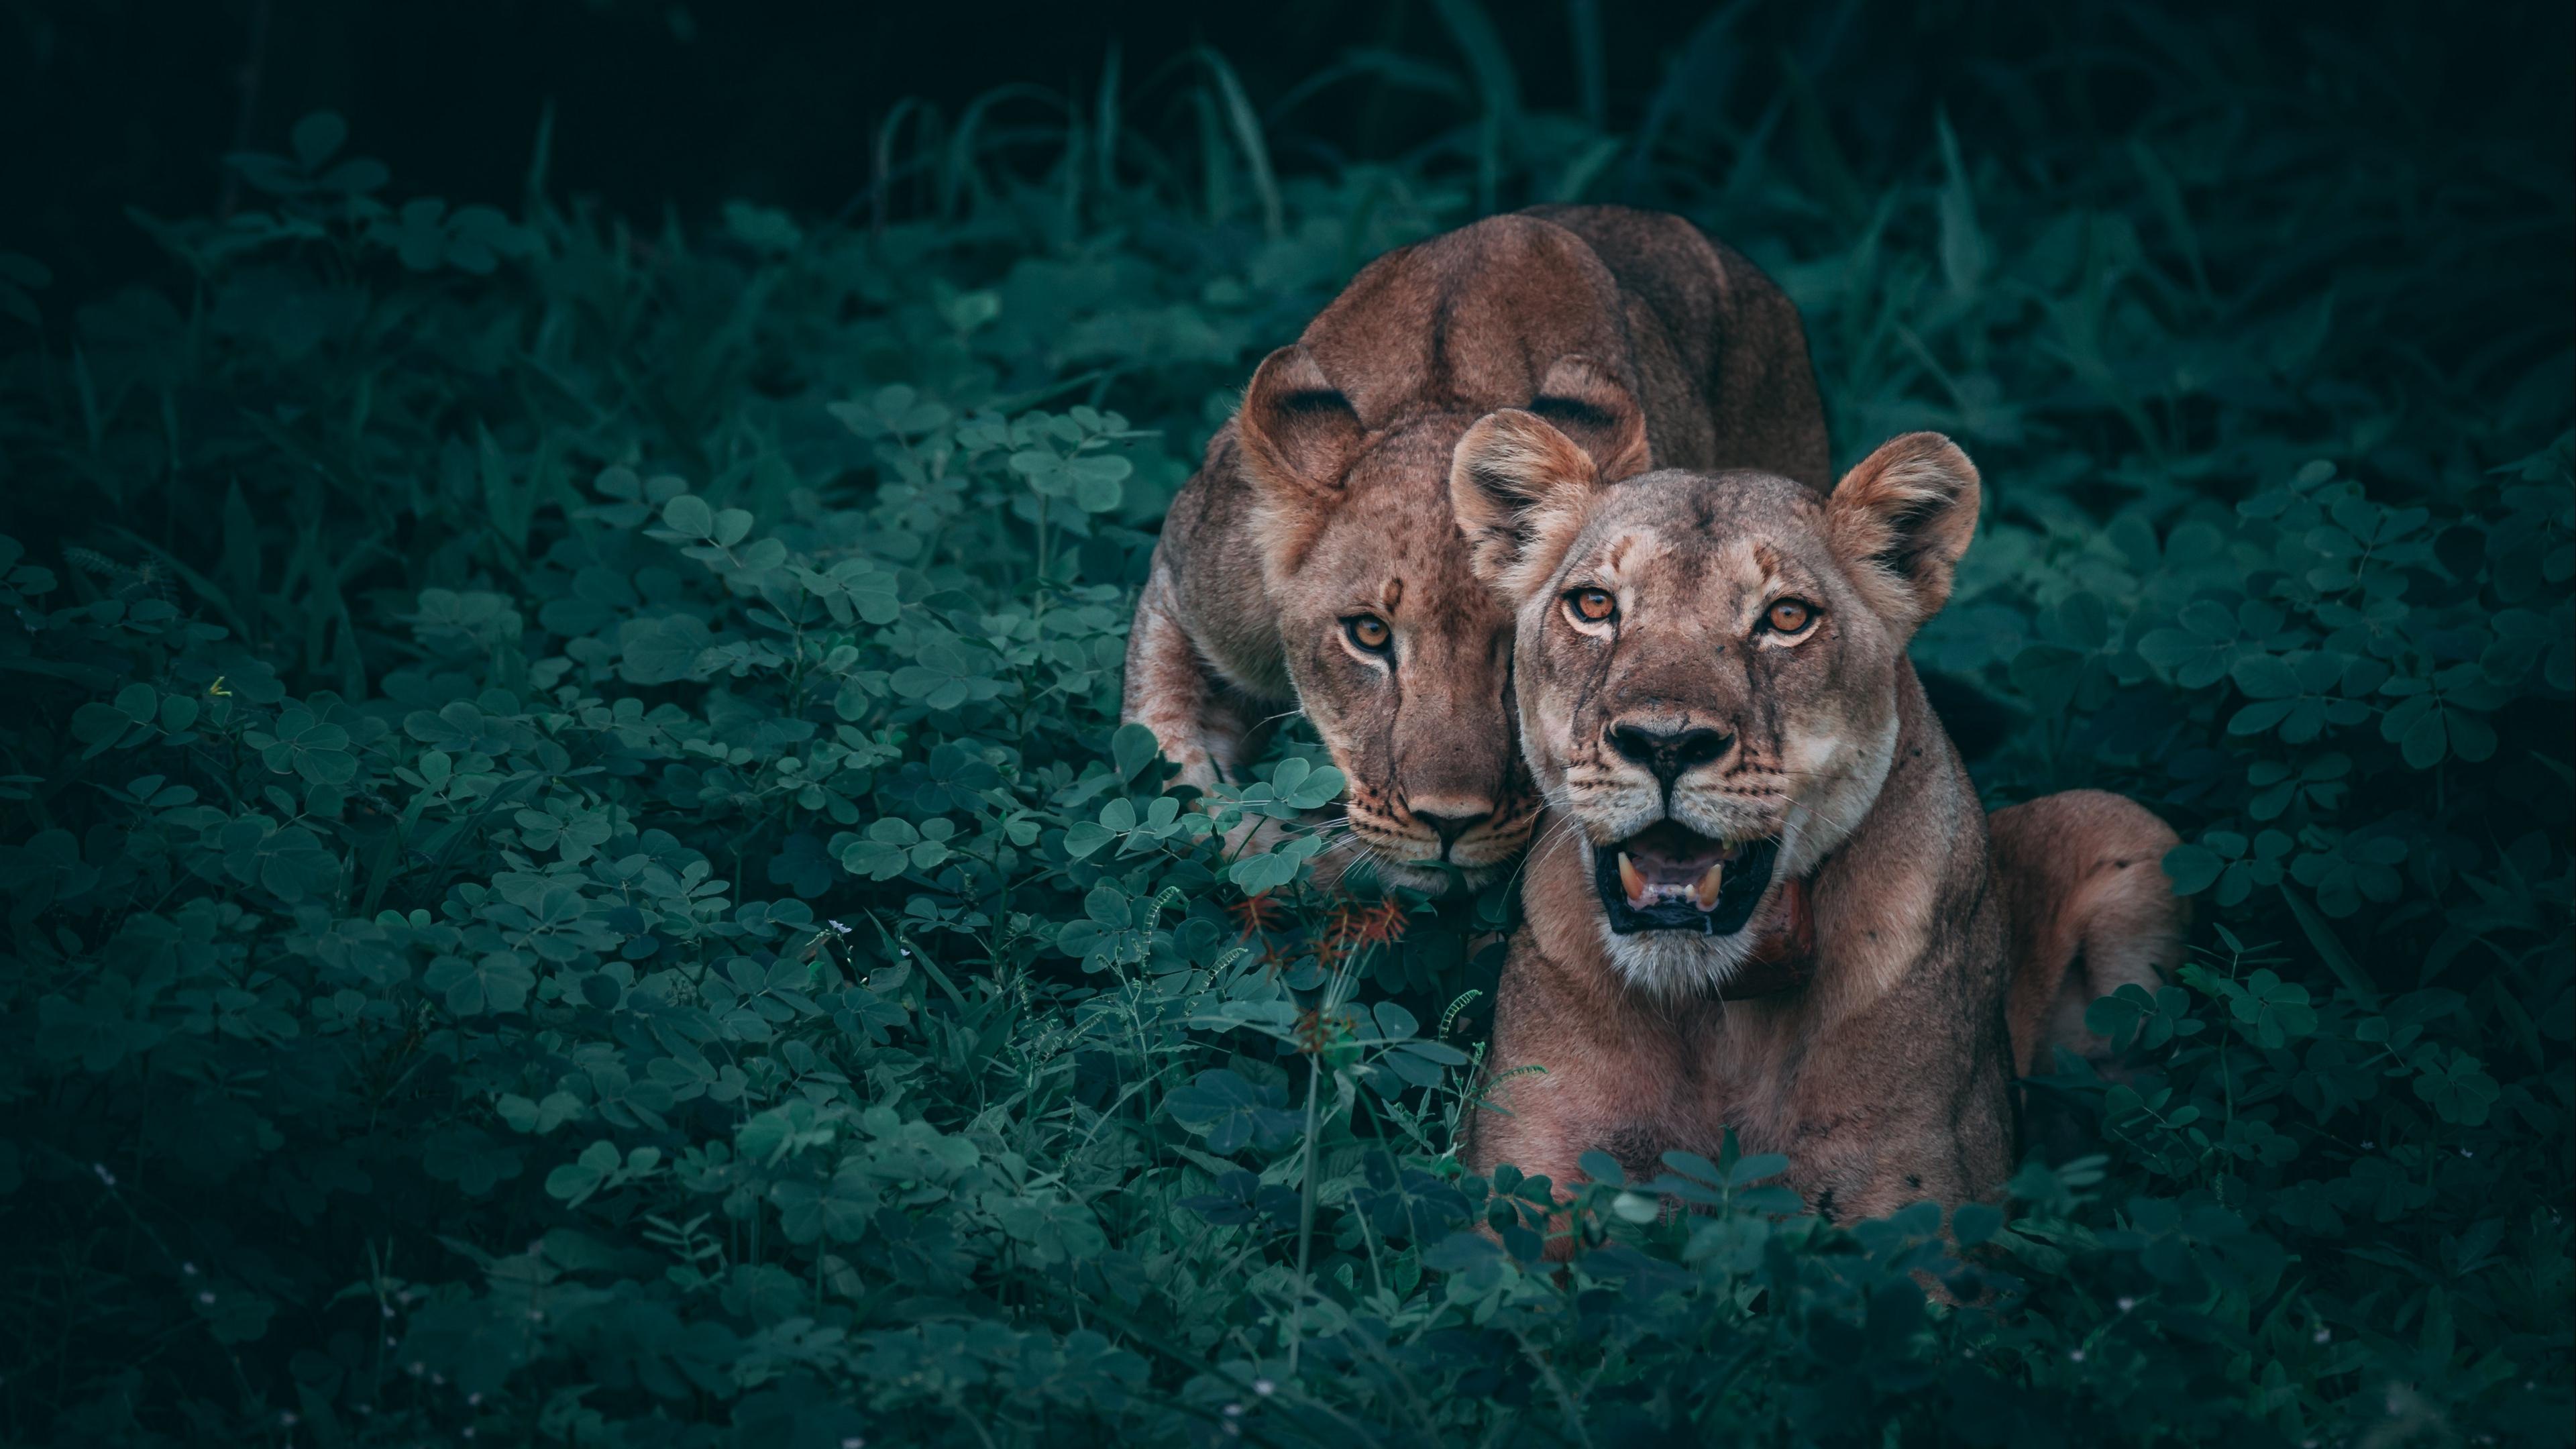 lionesses predators grass 4k 1542242778 - lionesses, predators, grass 4k - predators, lionesses, Grass